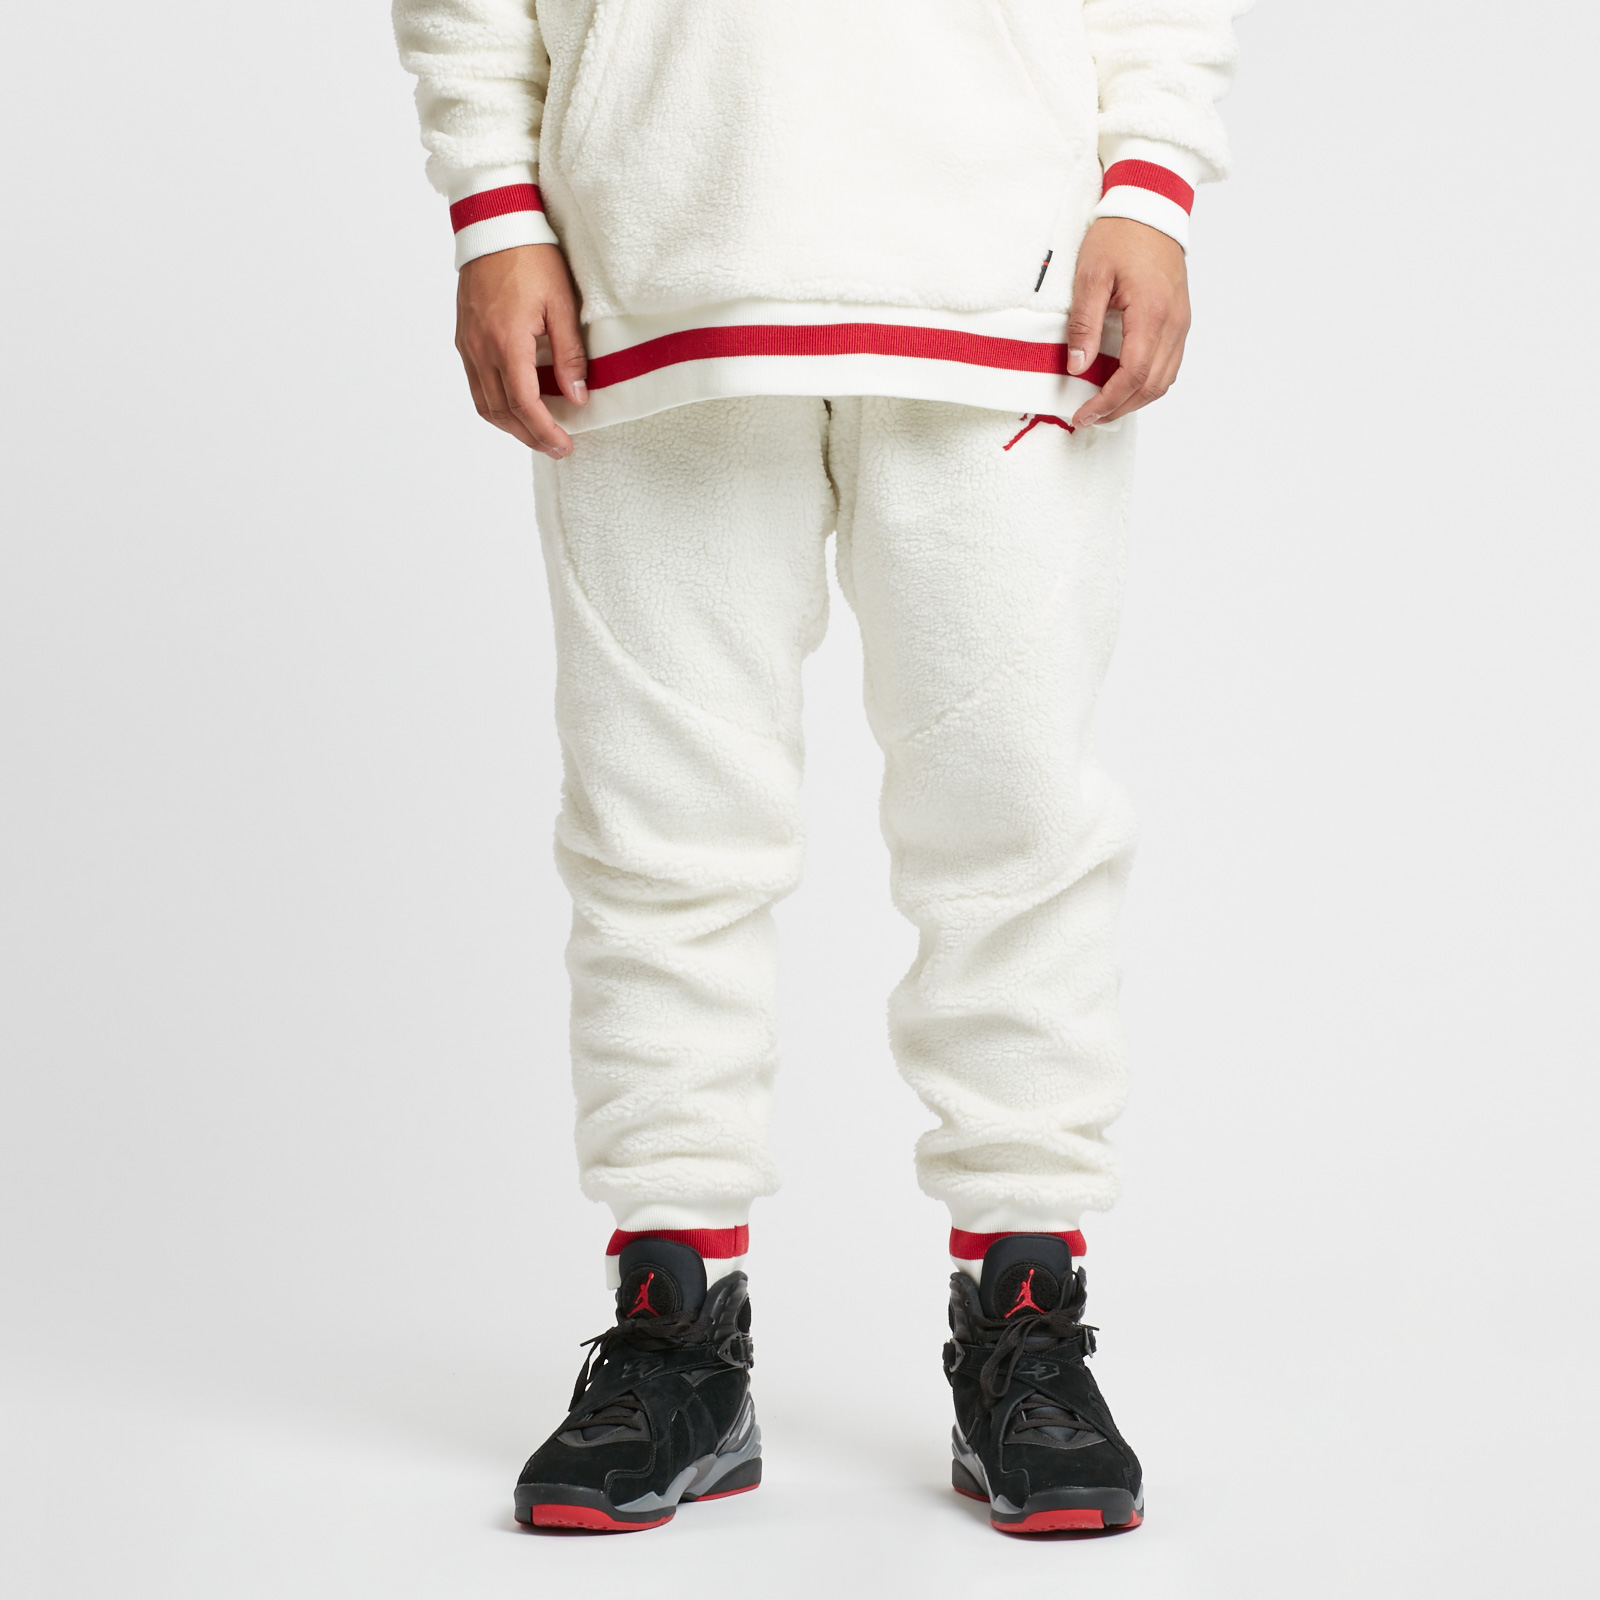 the best attitude 7c63a 736eb Jordan Brand Shearling AJ1 Fleece Pant